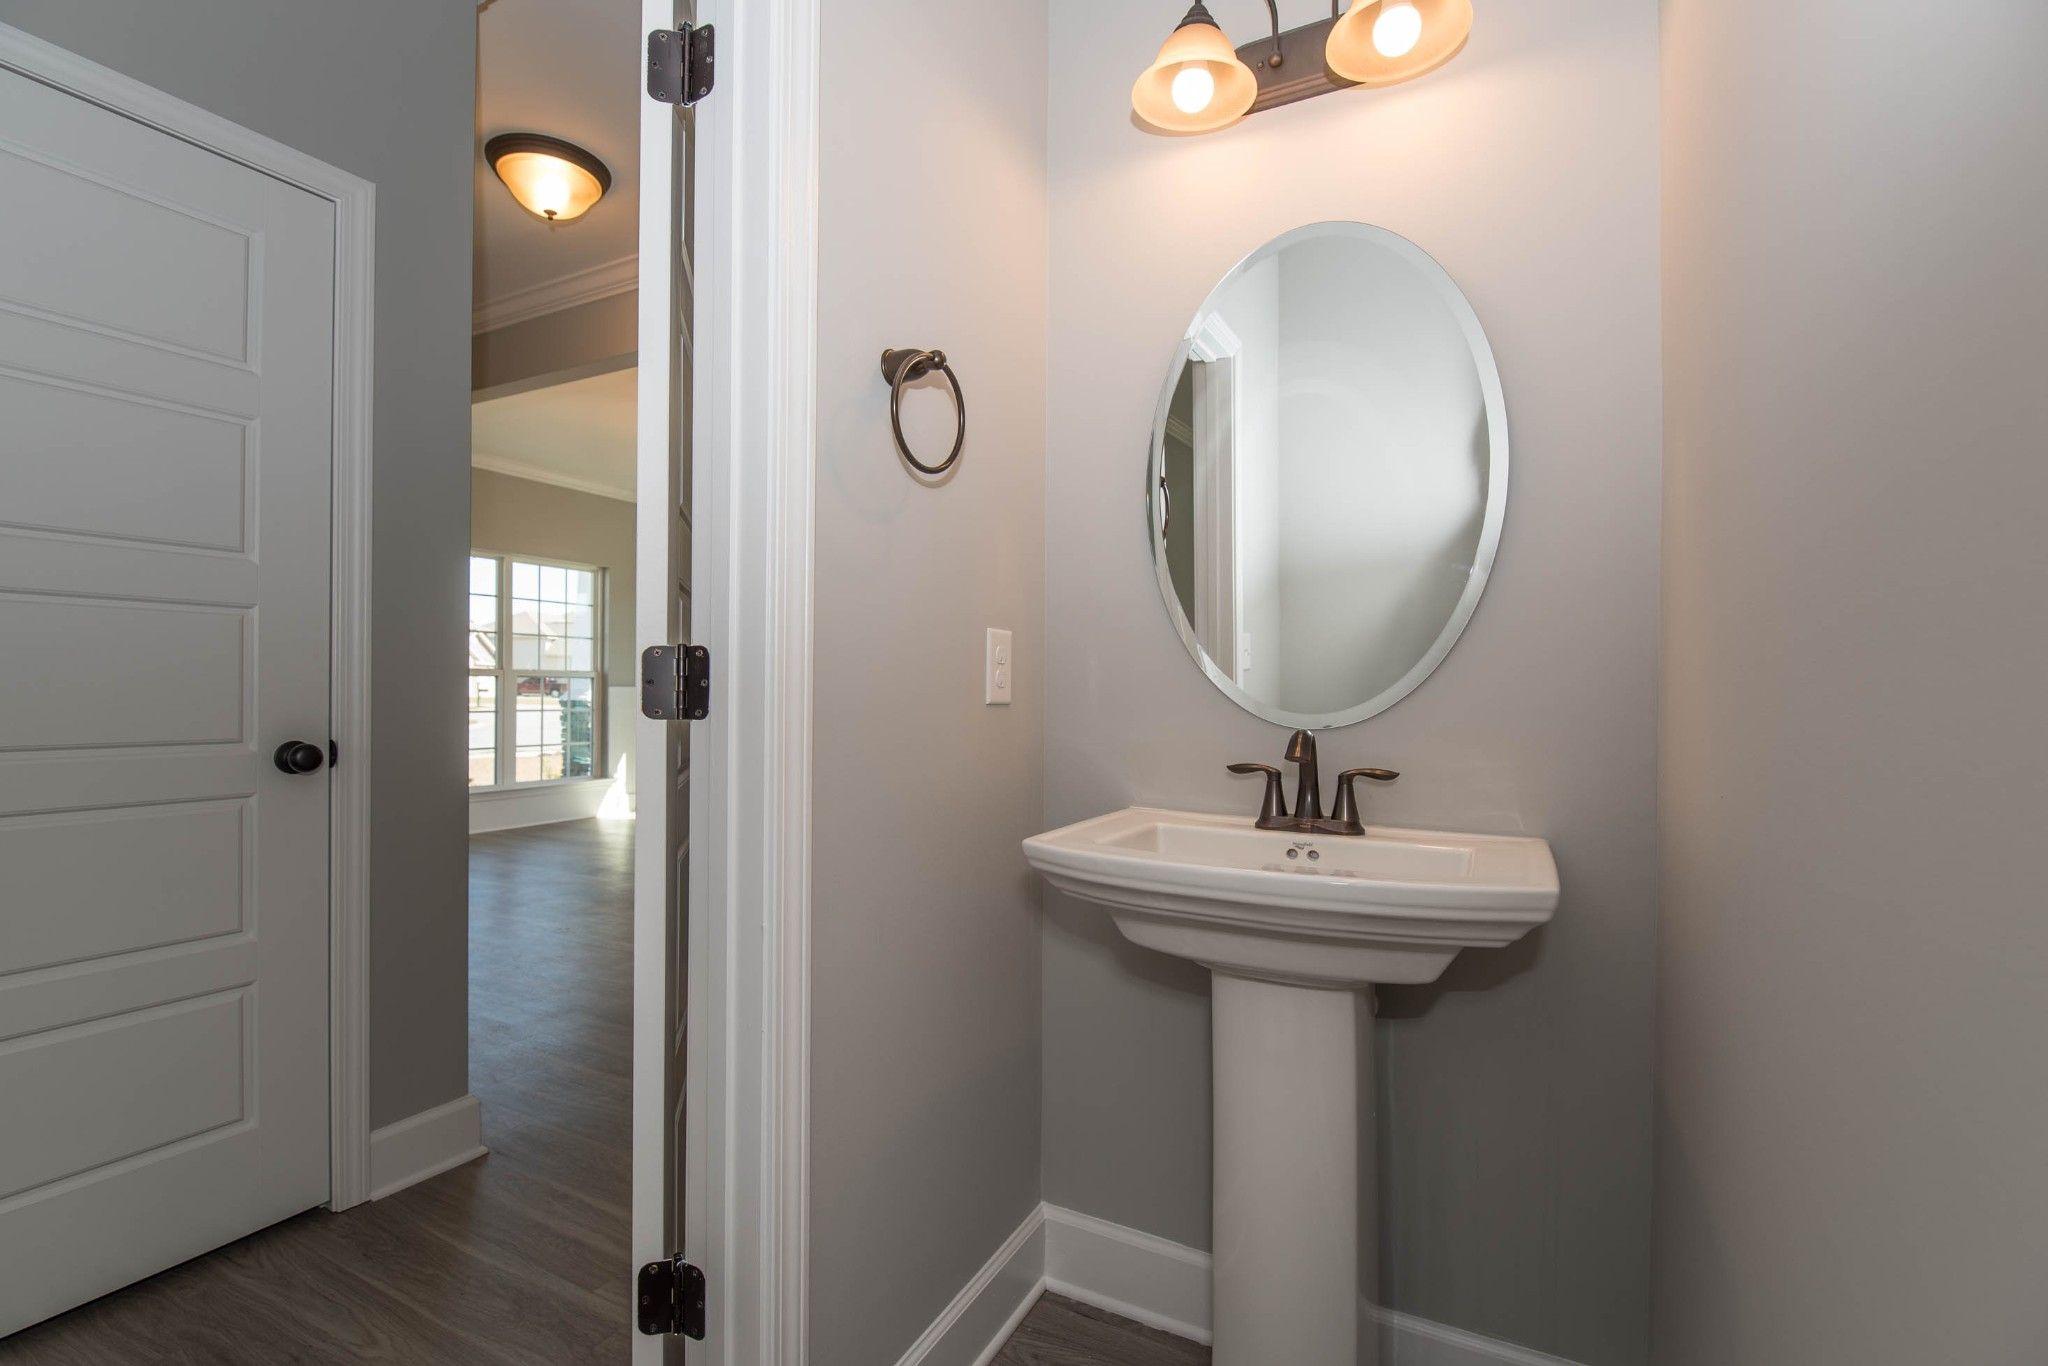 Bathroom featured in the Greybeard By Ernest Homes in Savannah, GA